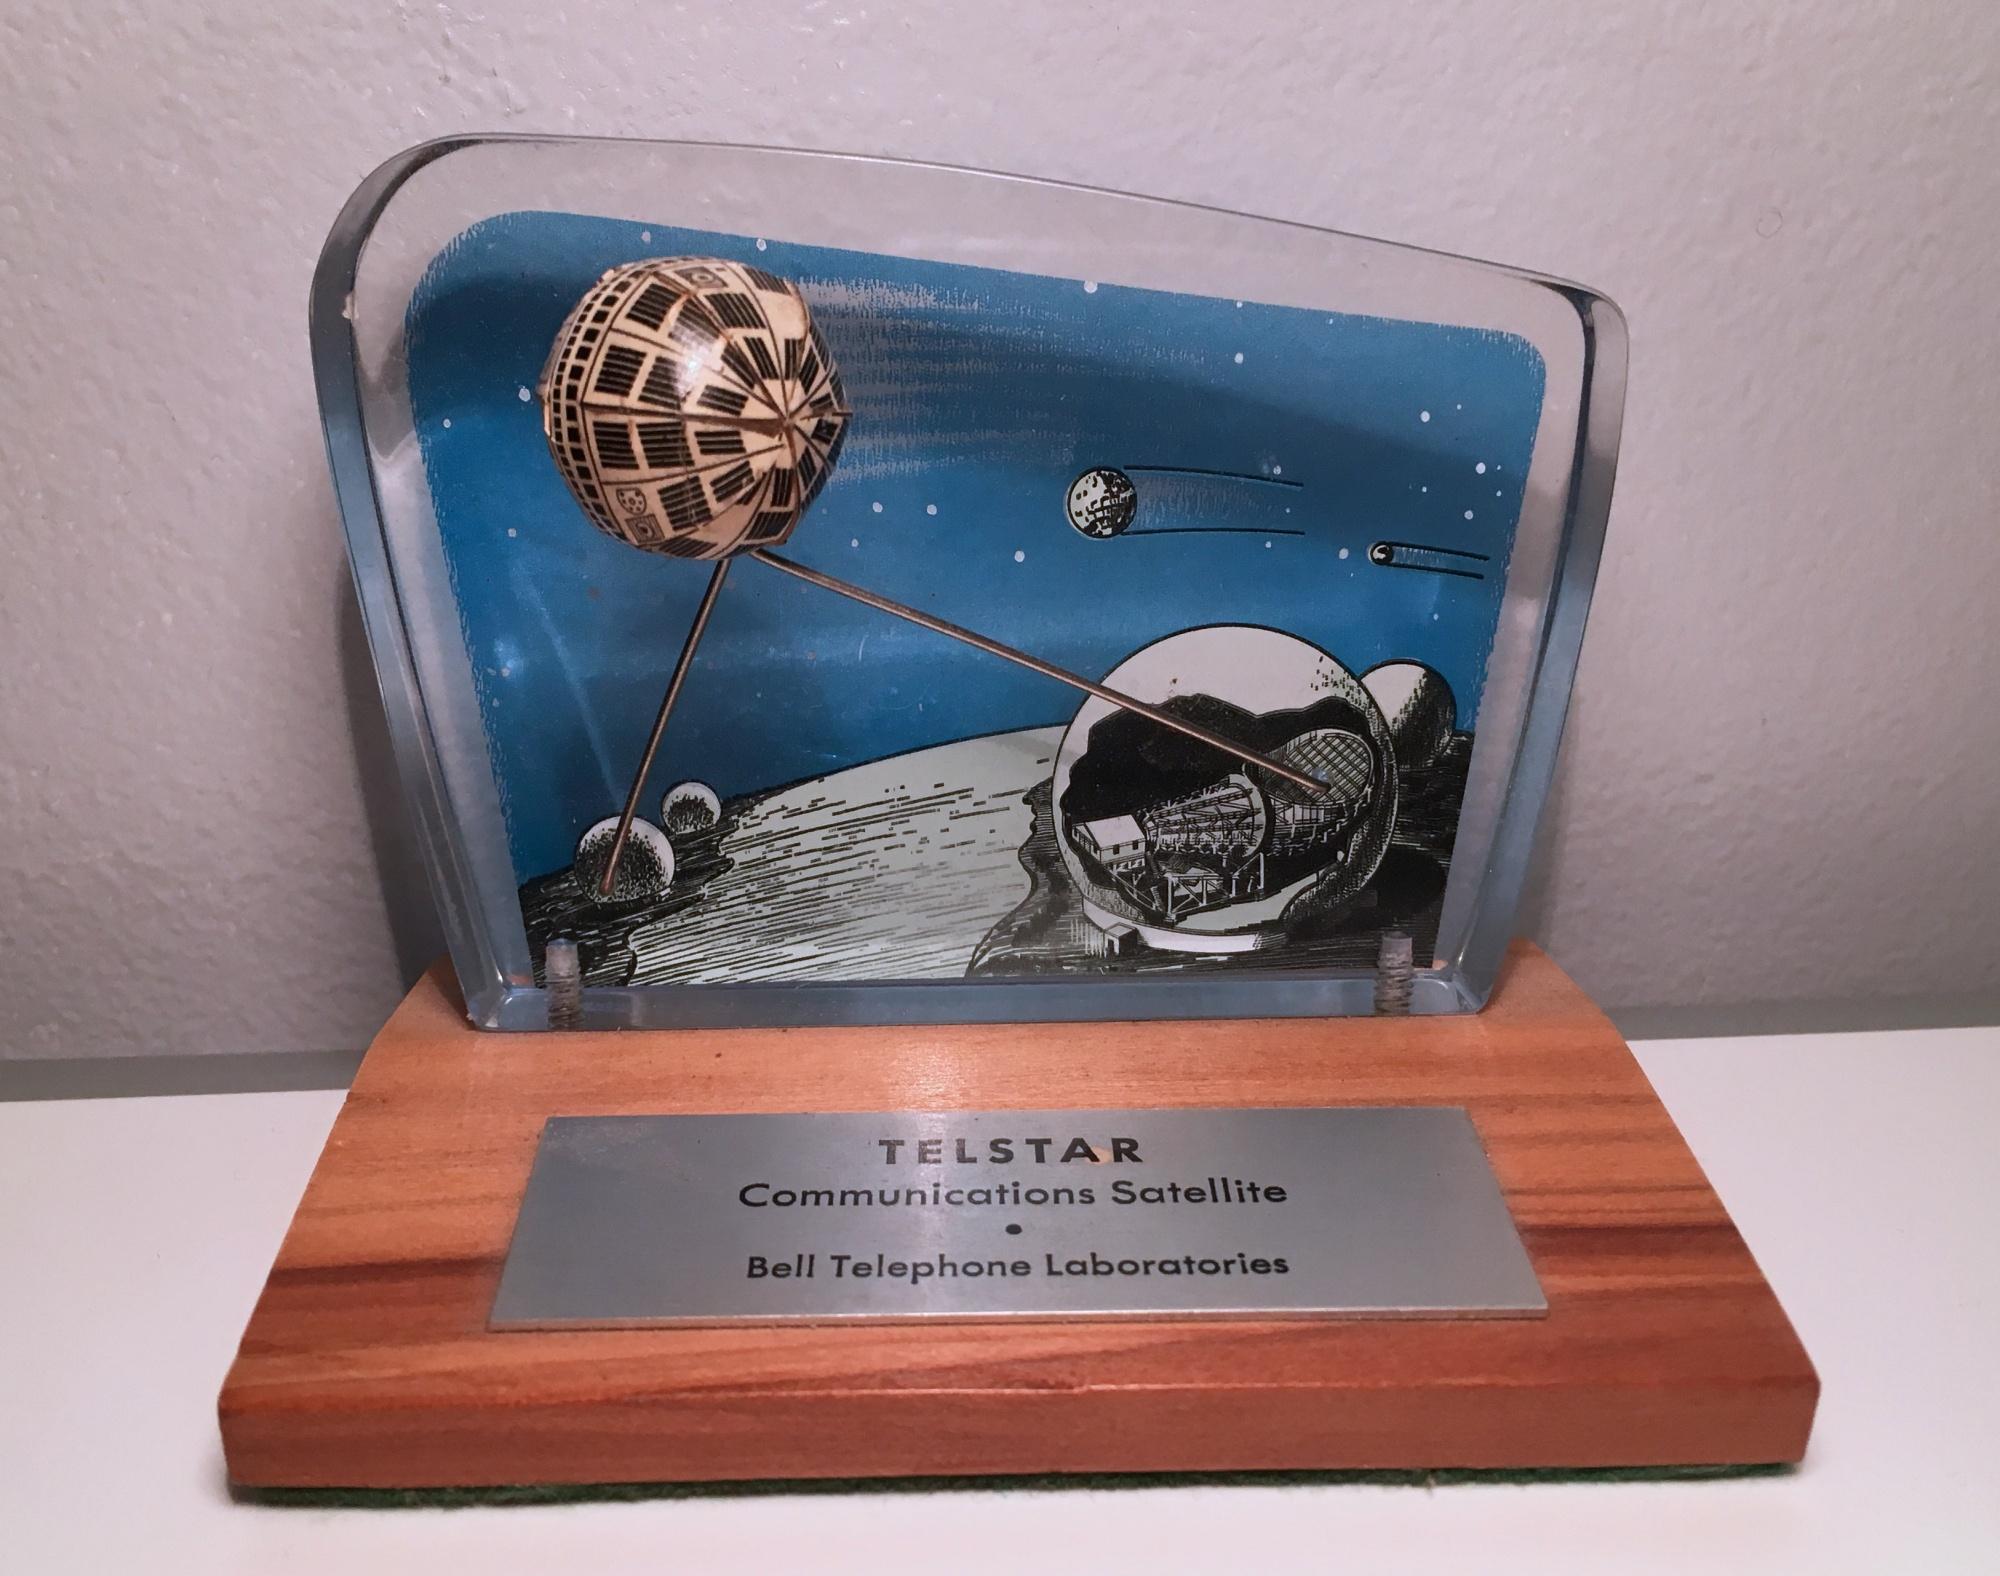 Telstar commemorative plaque